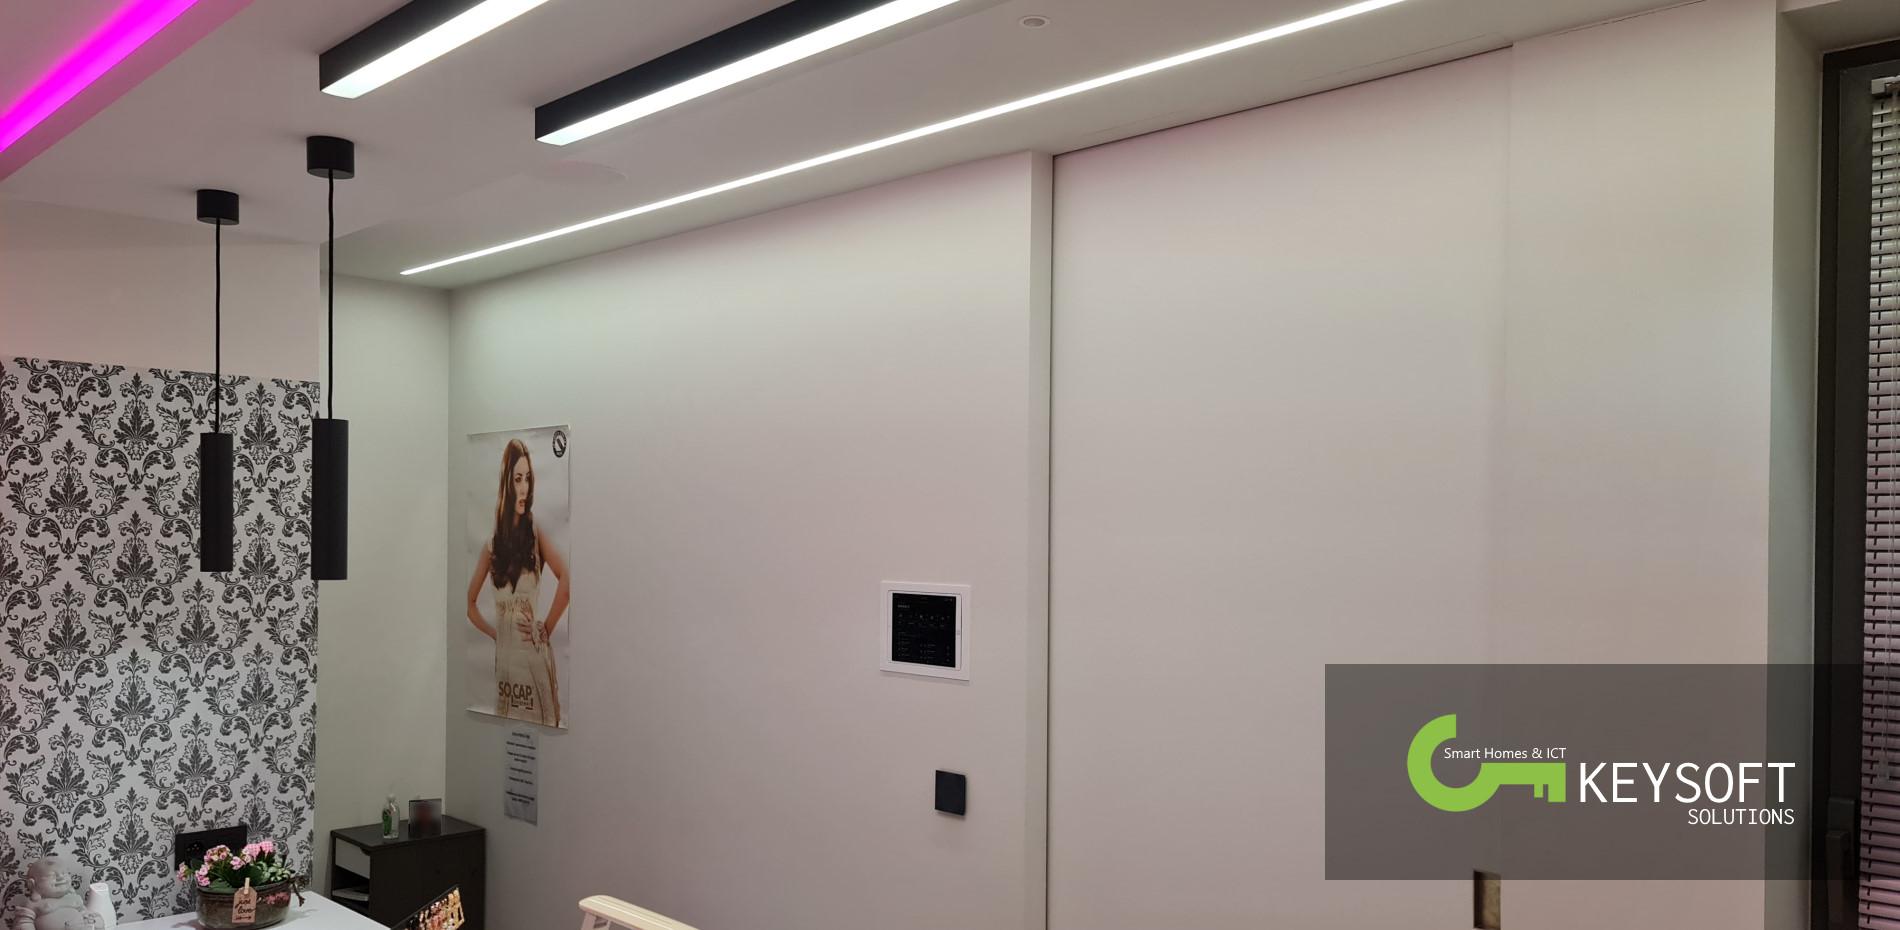 Keysoft-Solutions Smart Home Project - Hair & Beauty Lounge - Hoofdafbeelding